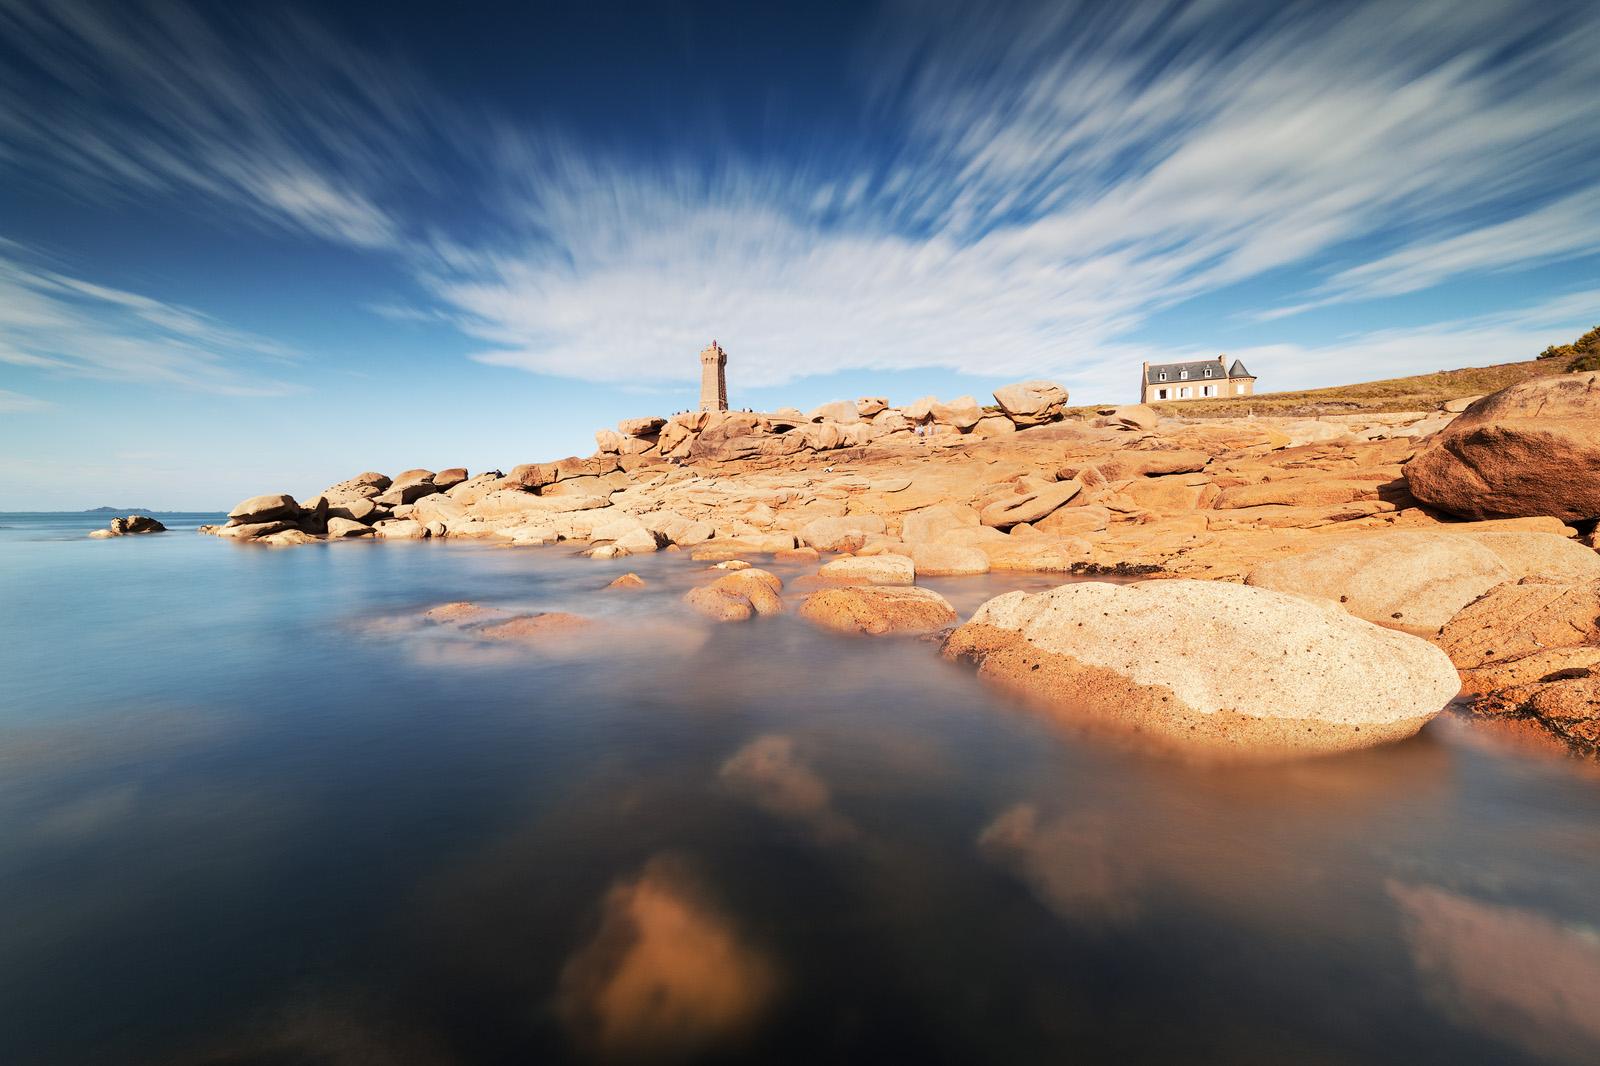 phare_granite_rose_paysage_pierre-louis_ferrer